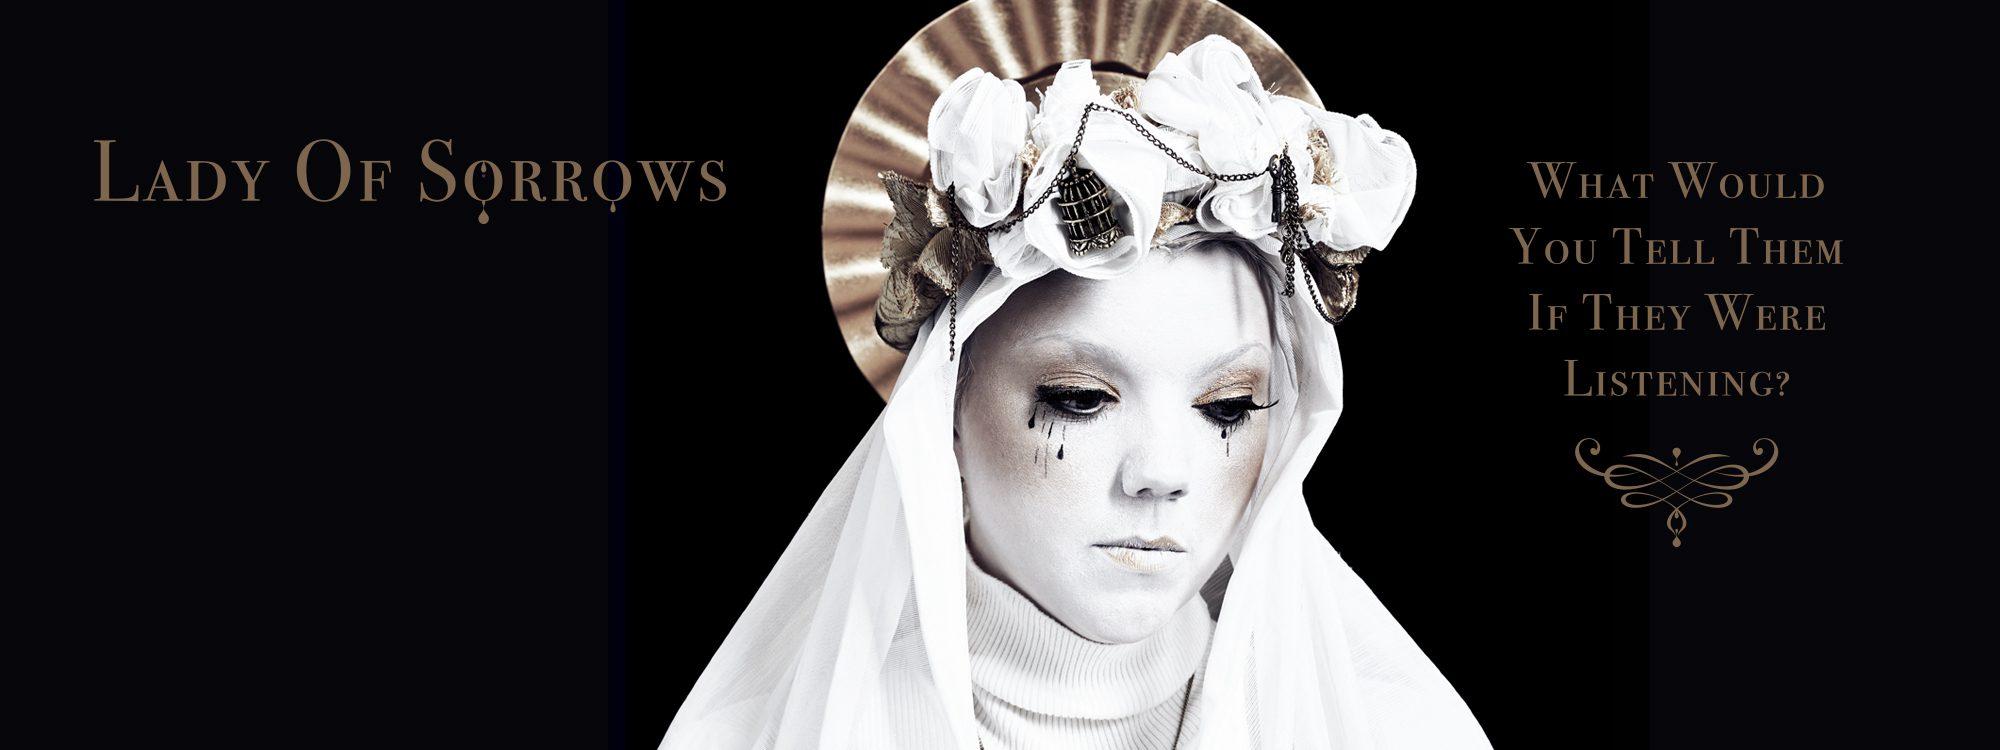 ladyofsorrows_profile_header_01